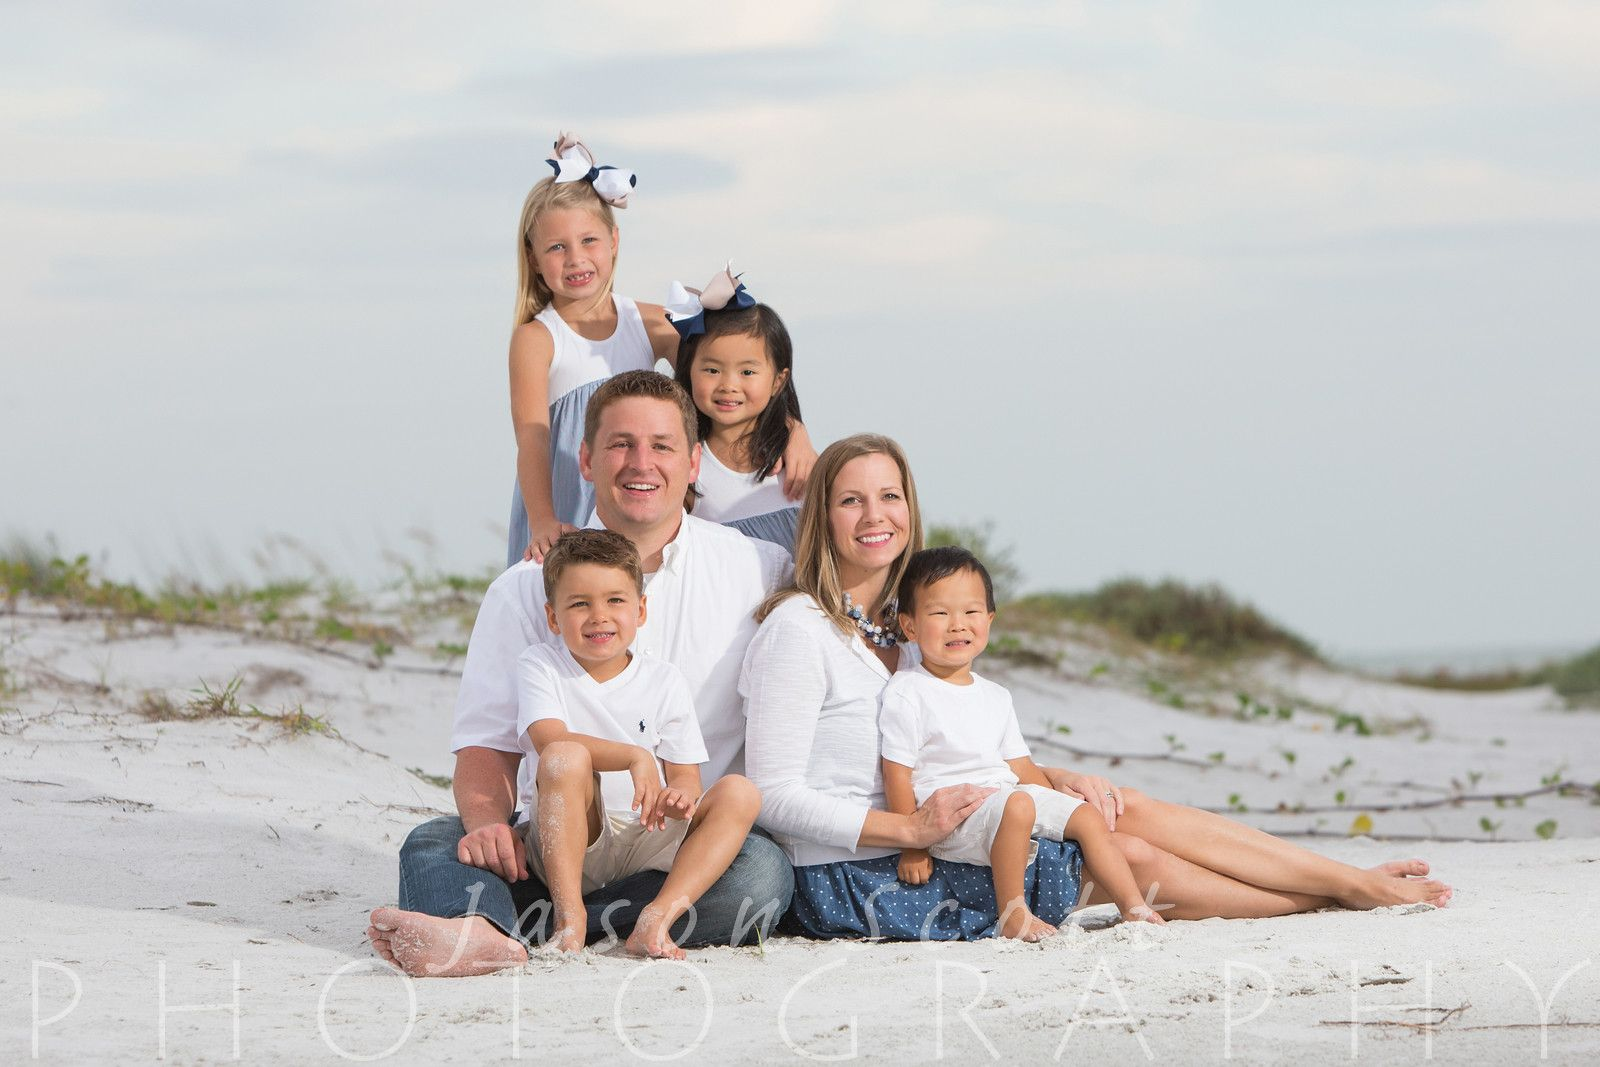 Siesta Key Beach Portraits   Family beach portraits, Beach ...